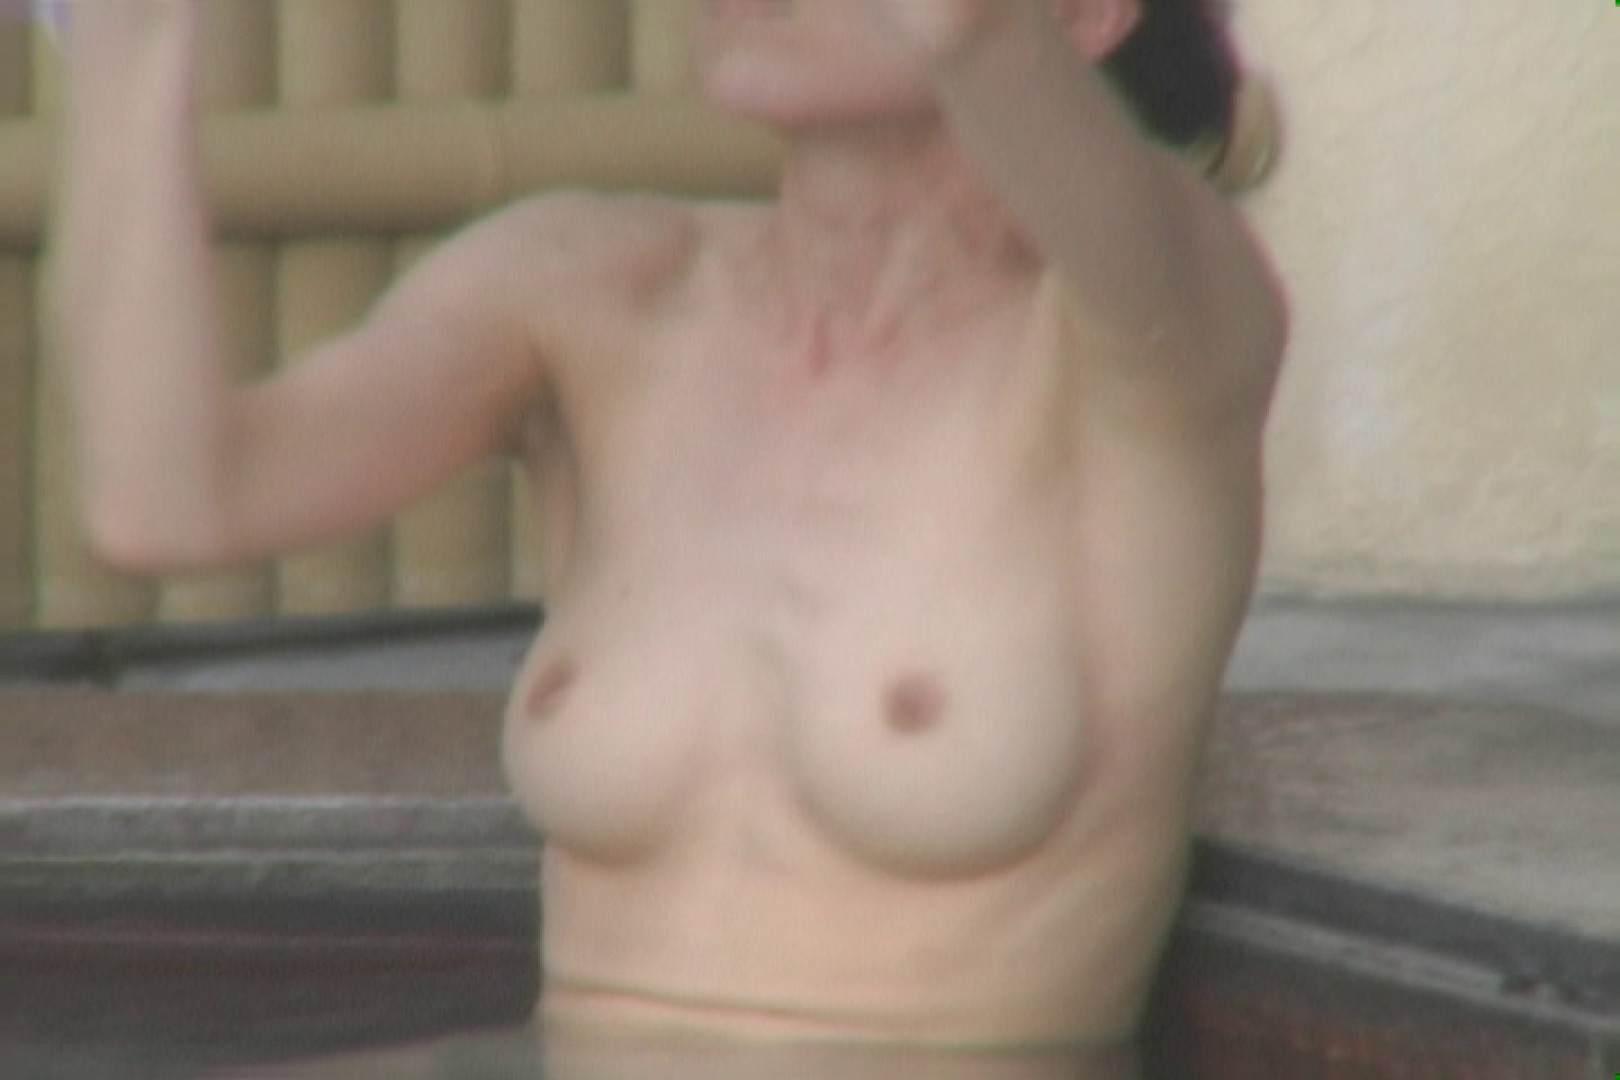 Aquaな露天風呂Vol.577 美しいOLの裸体 おめこ無修正動画無料 101pic 65